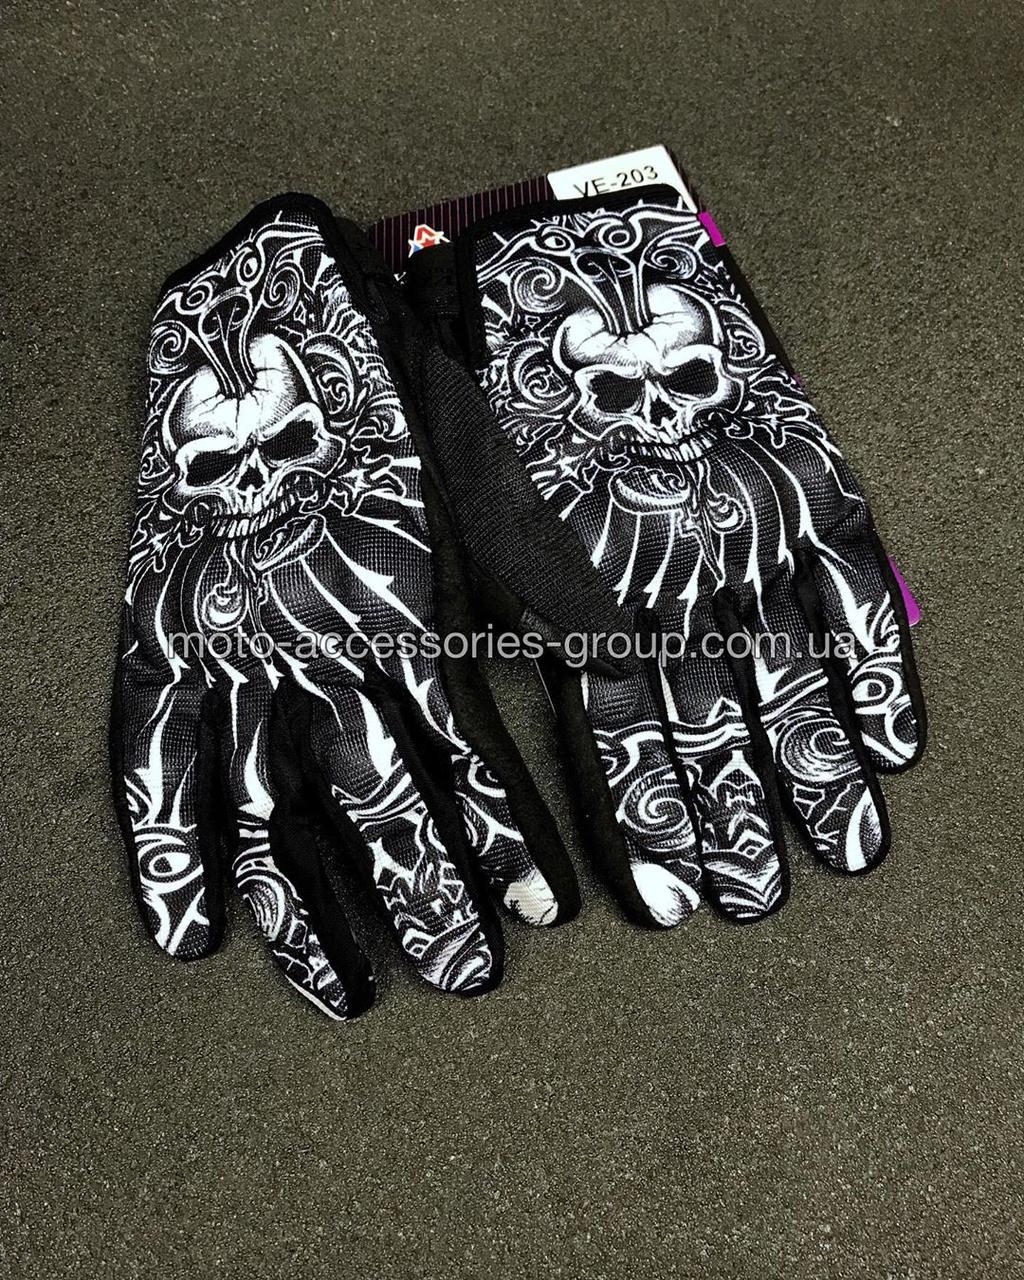 Мото перчатки VEMAR (череп)